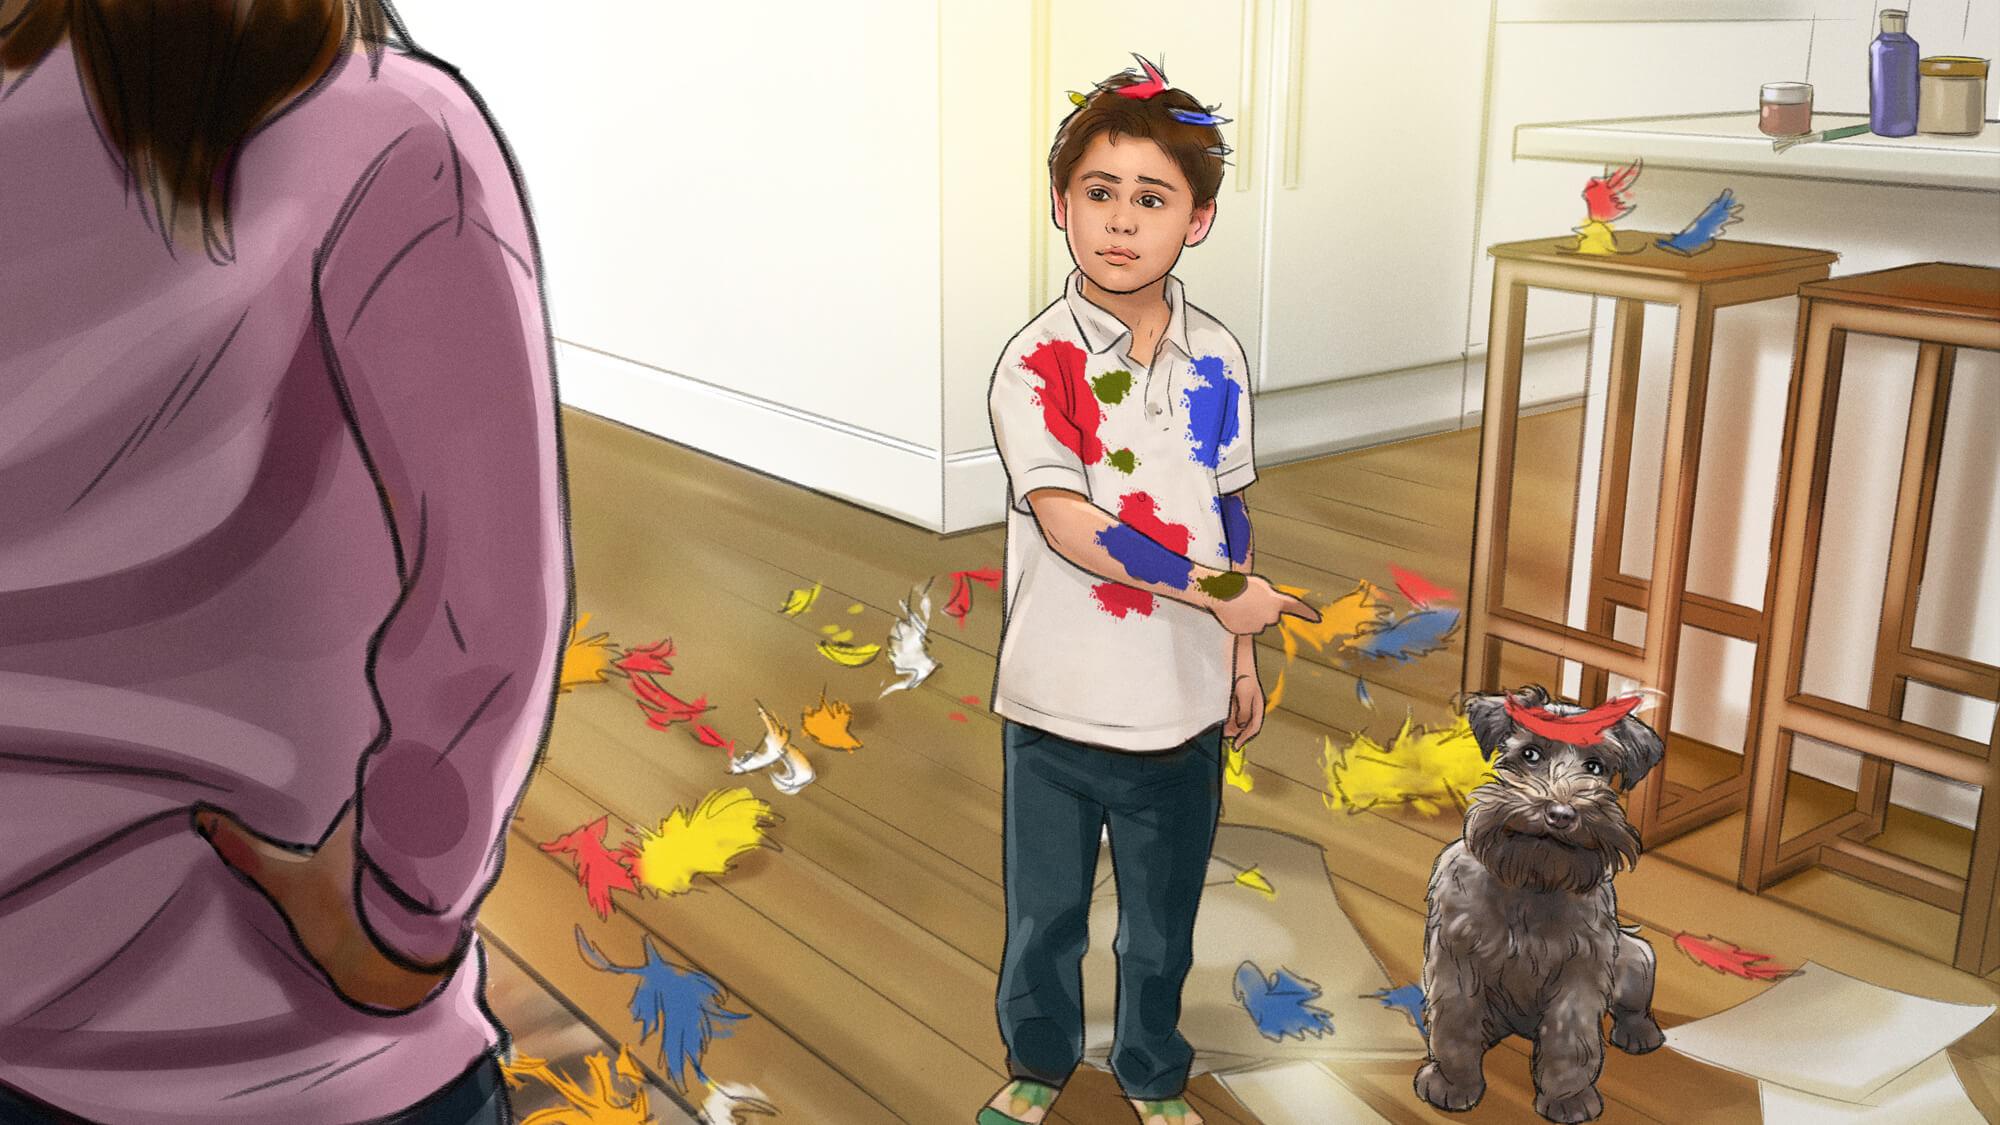 Kinder_Storyboard_3.jpg